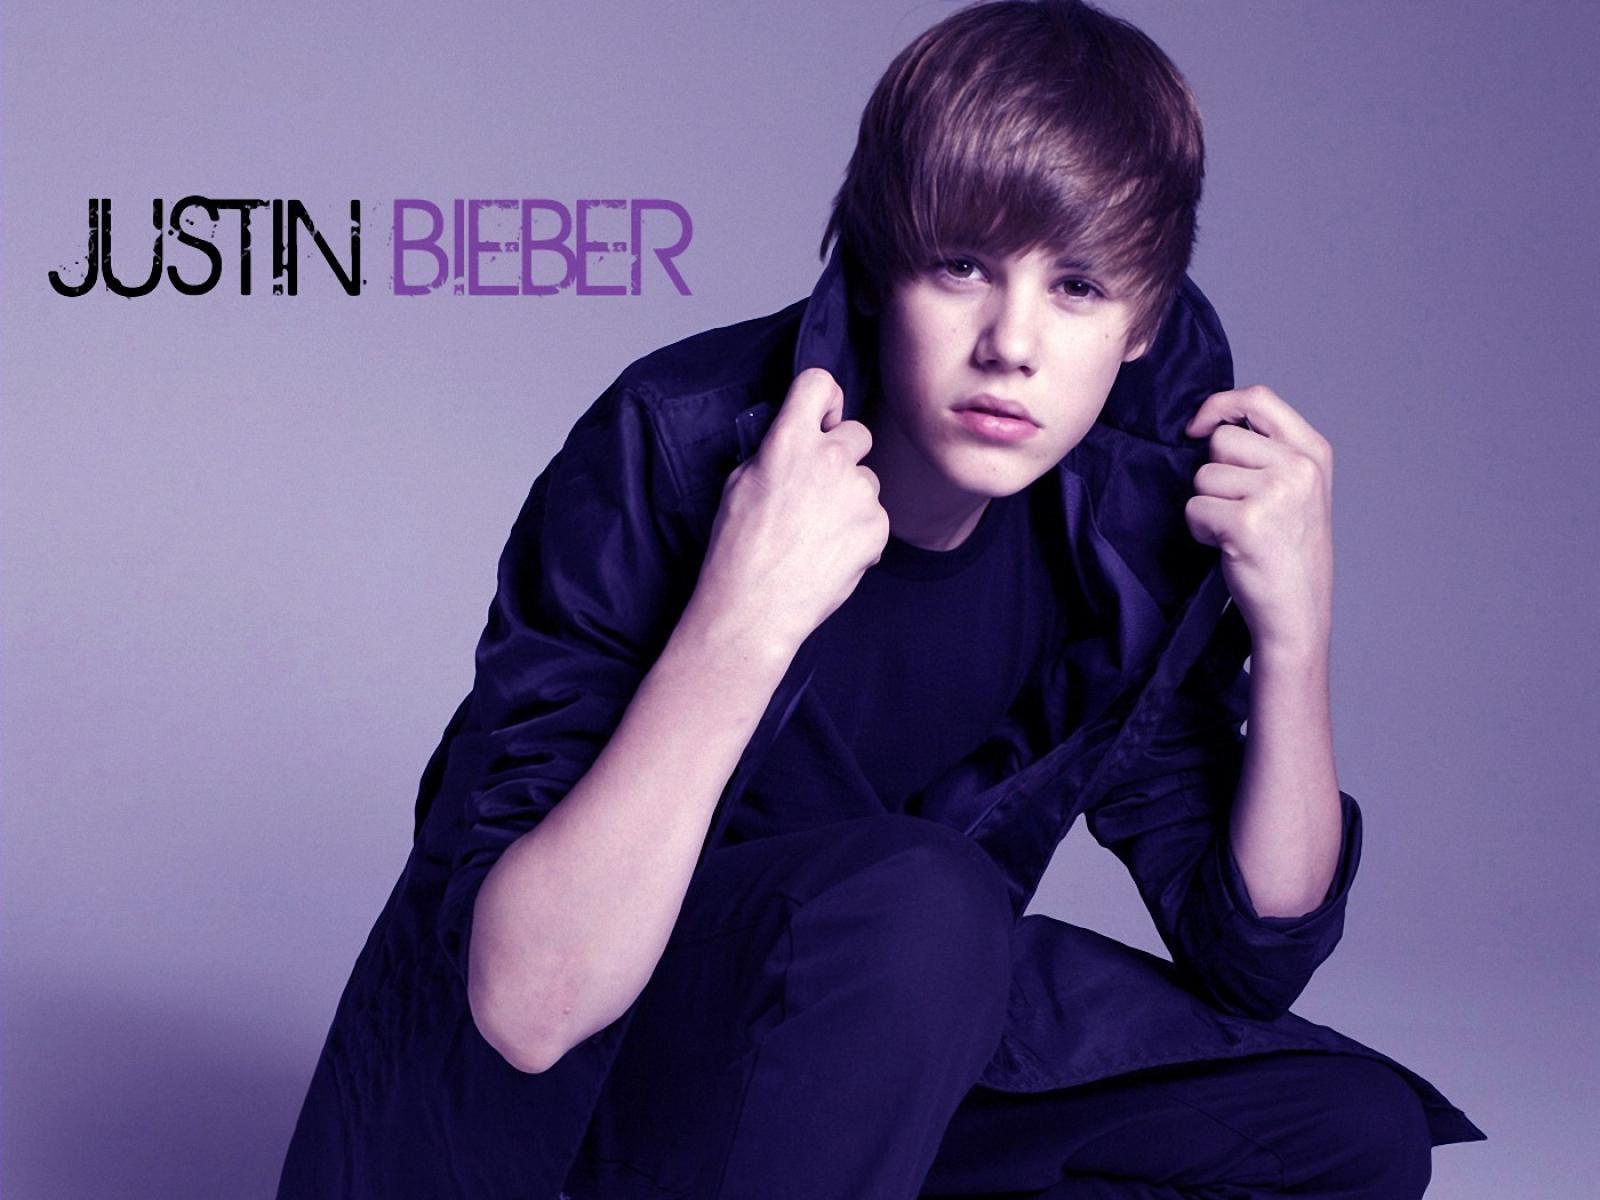 Justin Bieber Wallpapers Hd Wallpaper 1600 1200 Justin Bieber Pics Wallpapers 63 Wallpapers Justin Bieber Wallpaper Justin Bieber News Justin Bieber Pictures